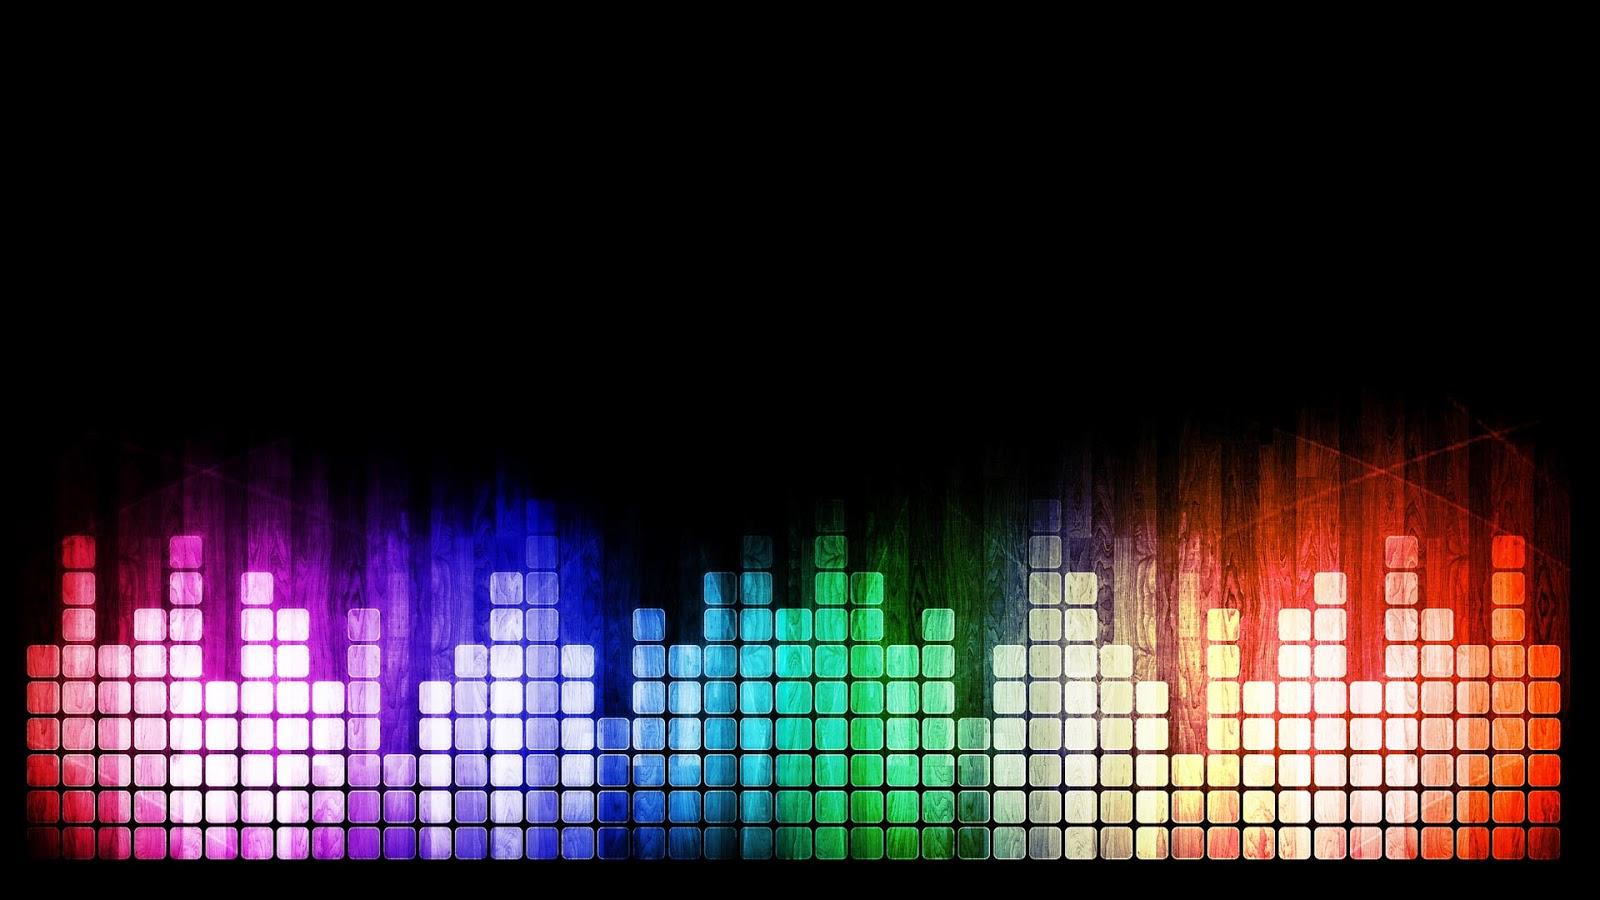 Http:/getshared.us/iphone 5 wallpaper tumblr music - Edm Iphone Wallpaper Tumblr Edm Wallpaper Hd Iphhone Edm Wallpaper